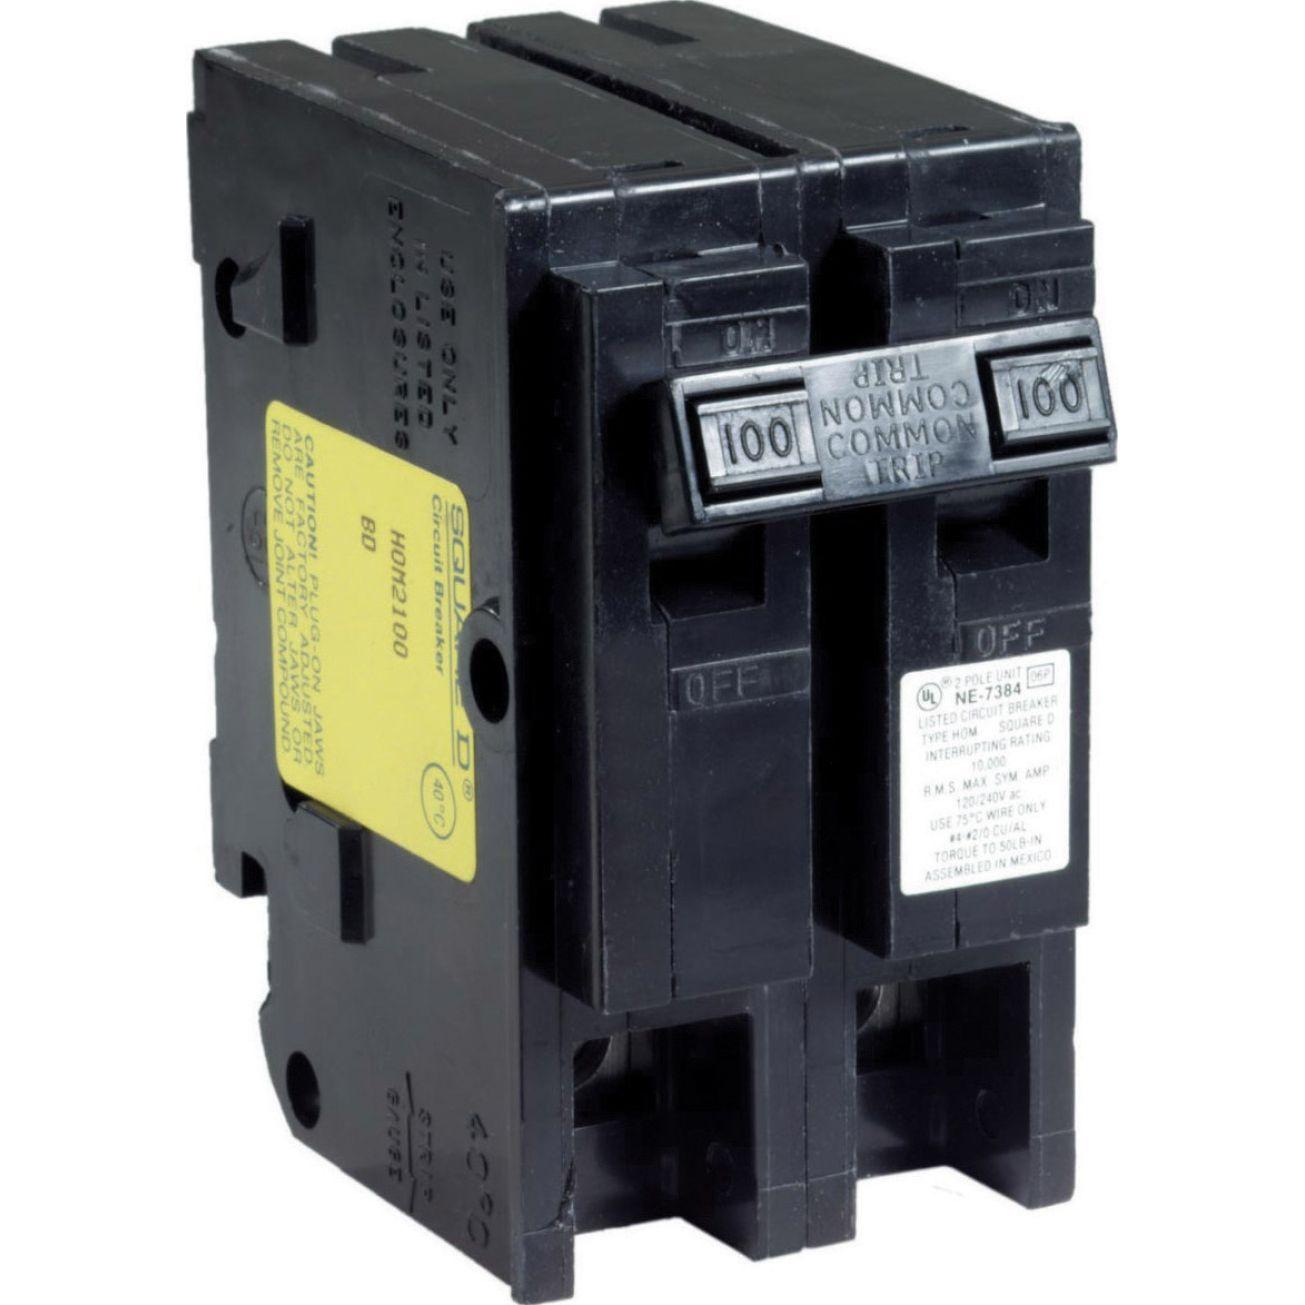 Homeline 100 Amp Double Pole Circuit Breaker Hom2100cp Non Interchangable Circuit Breakers Ace Hardware Electrical Breakers Circuit Breakers